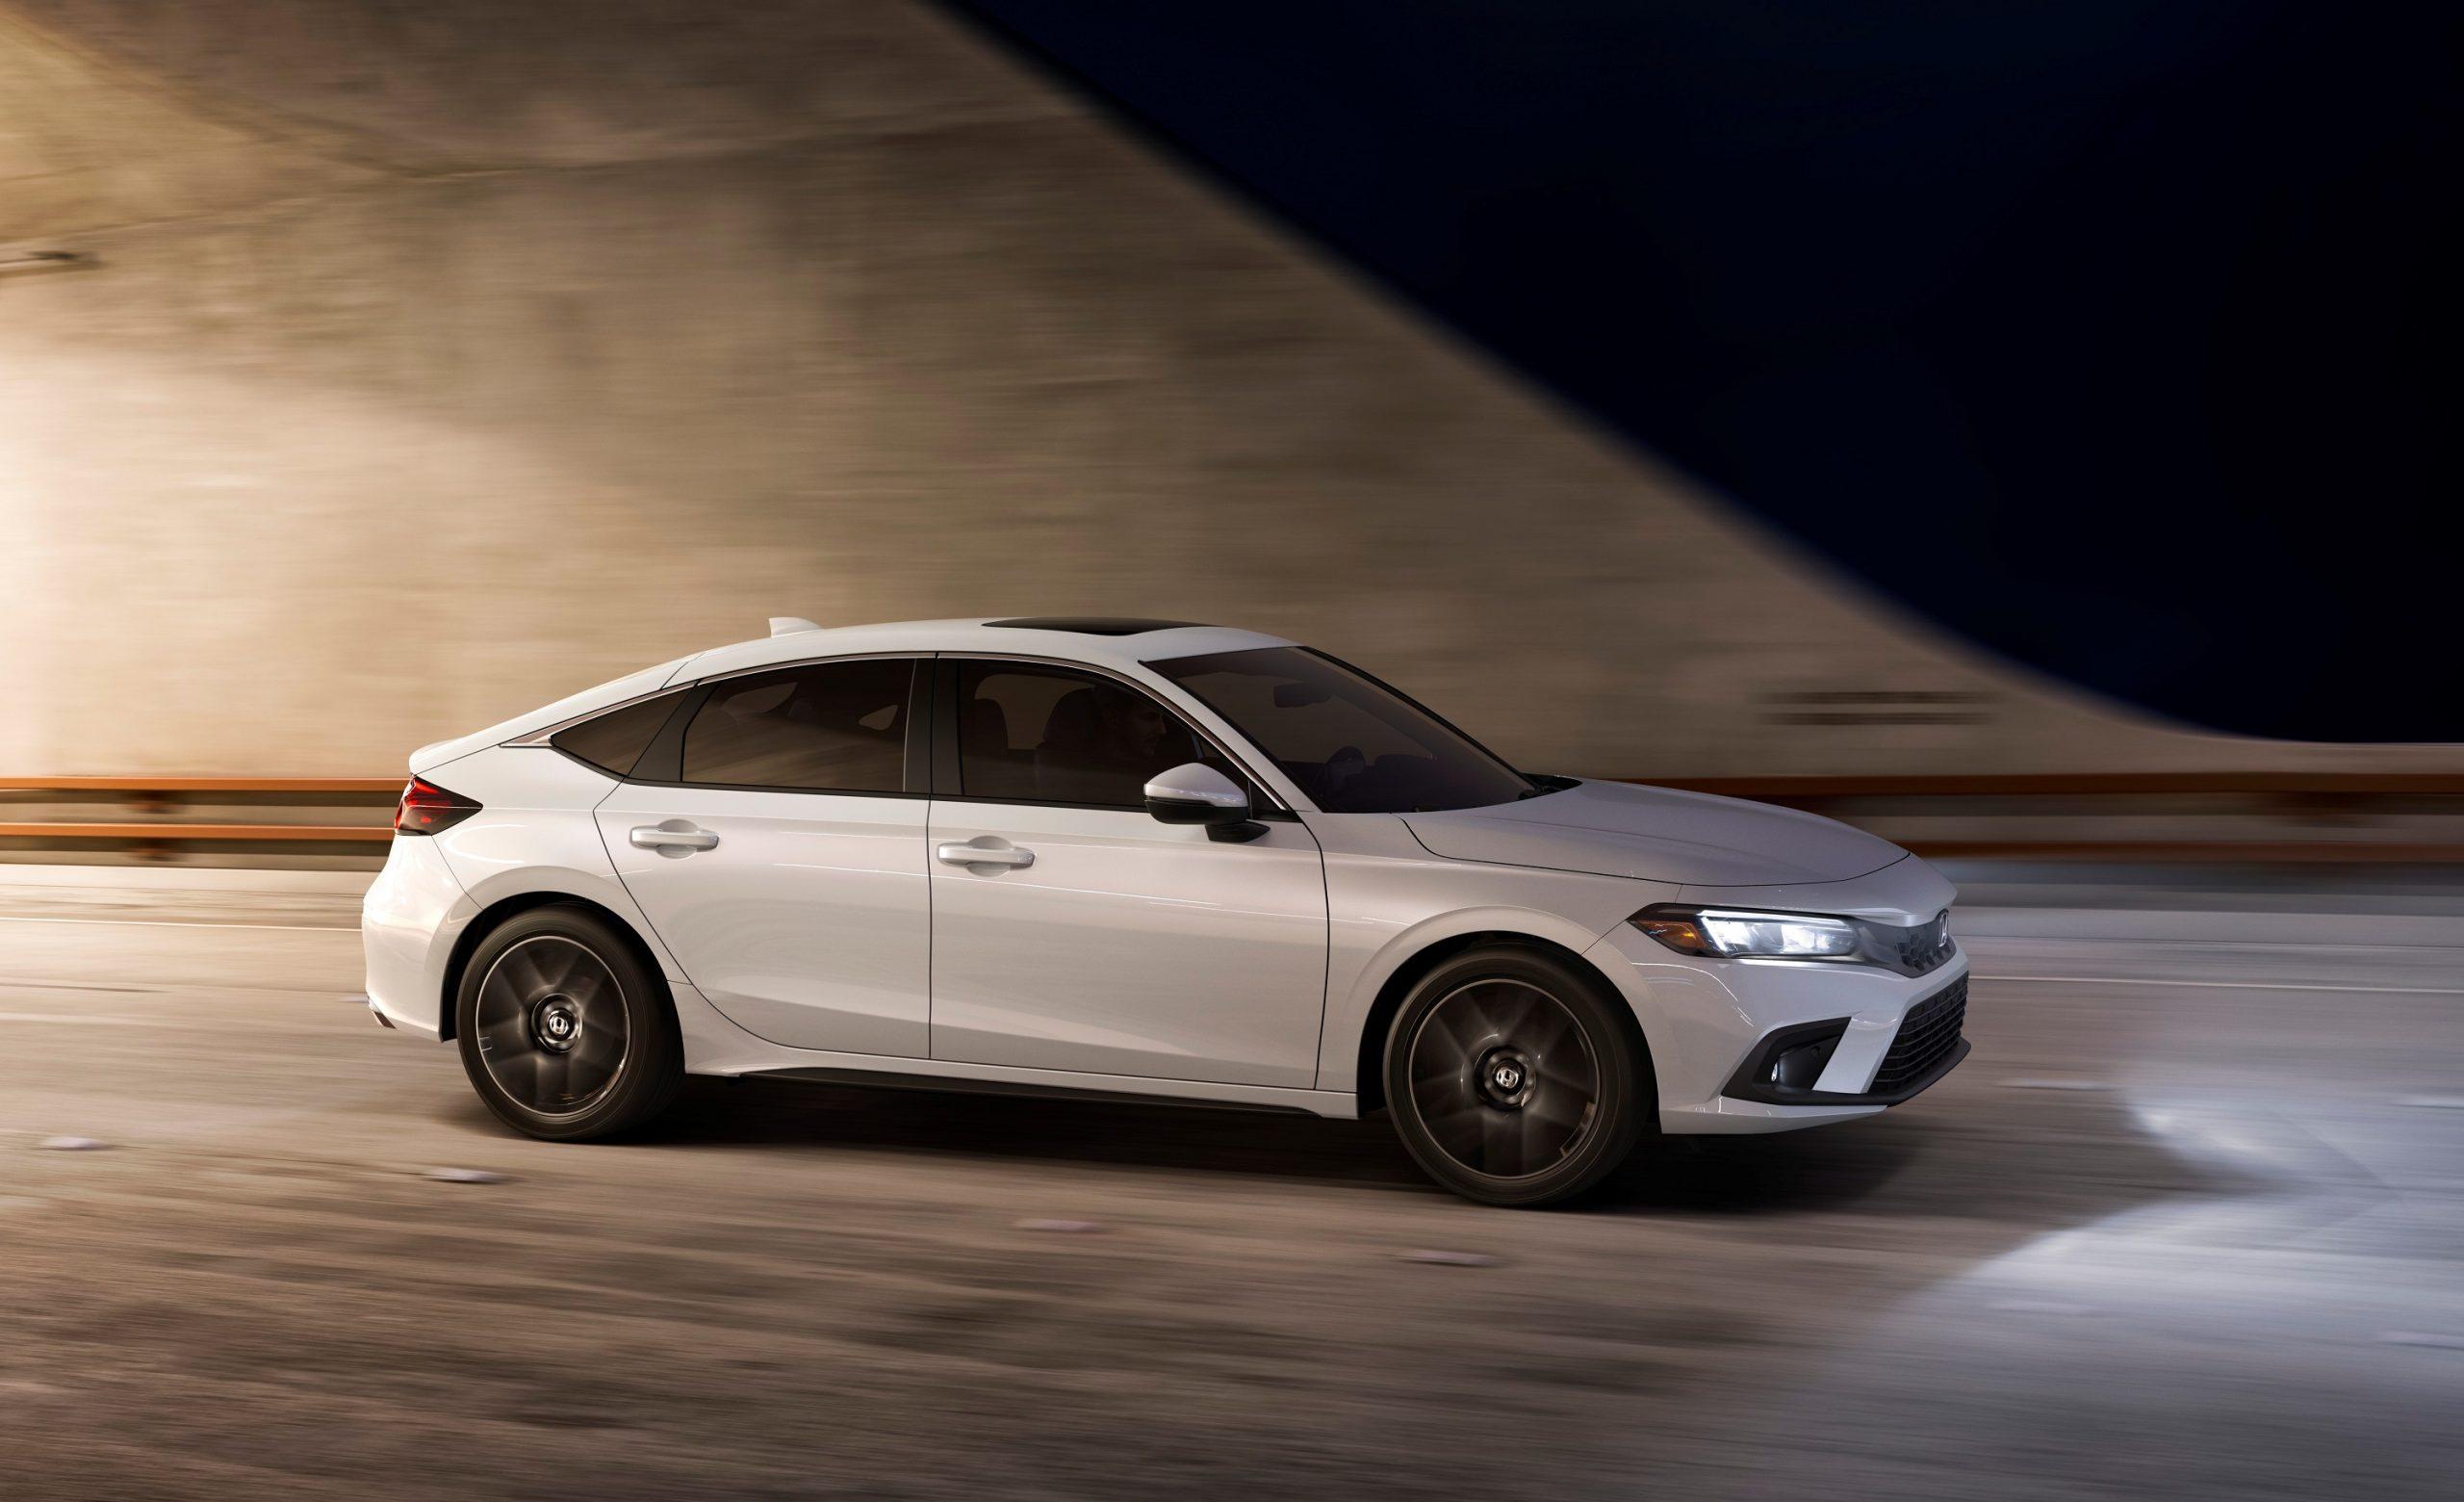 A white 2022 Honda Civic shot in profile at night